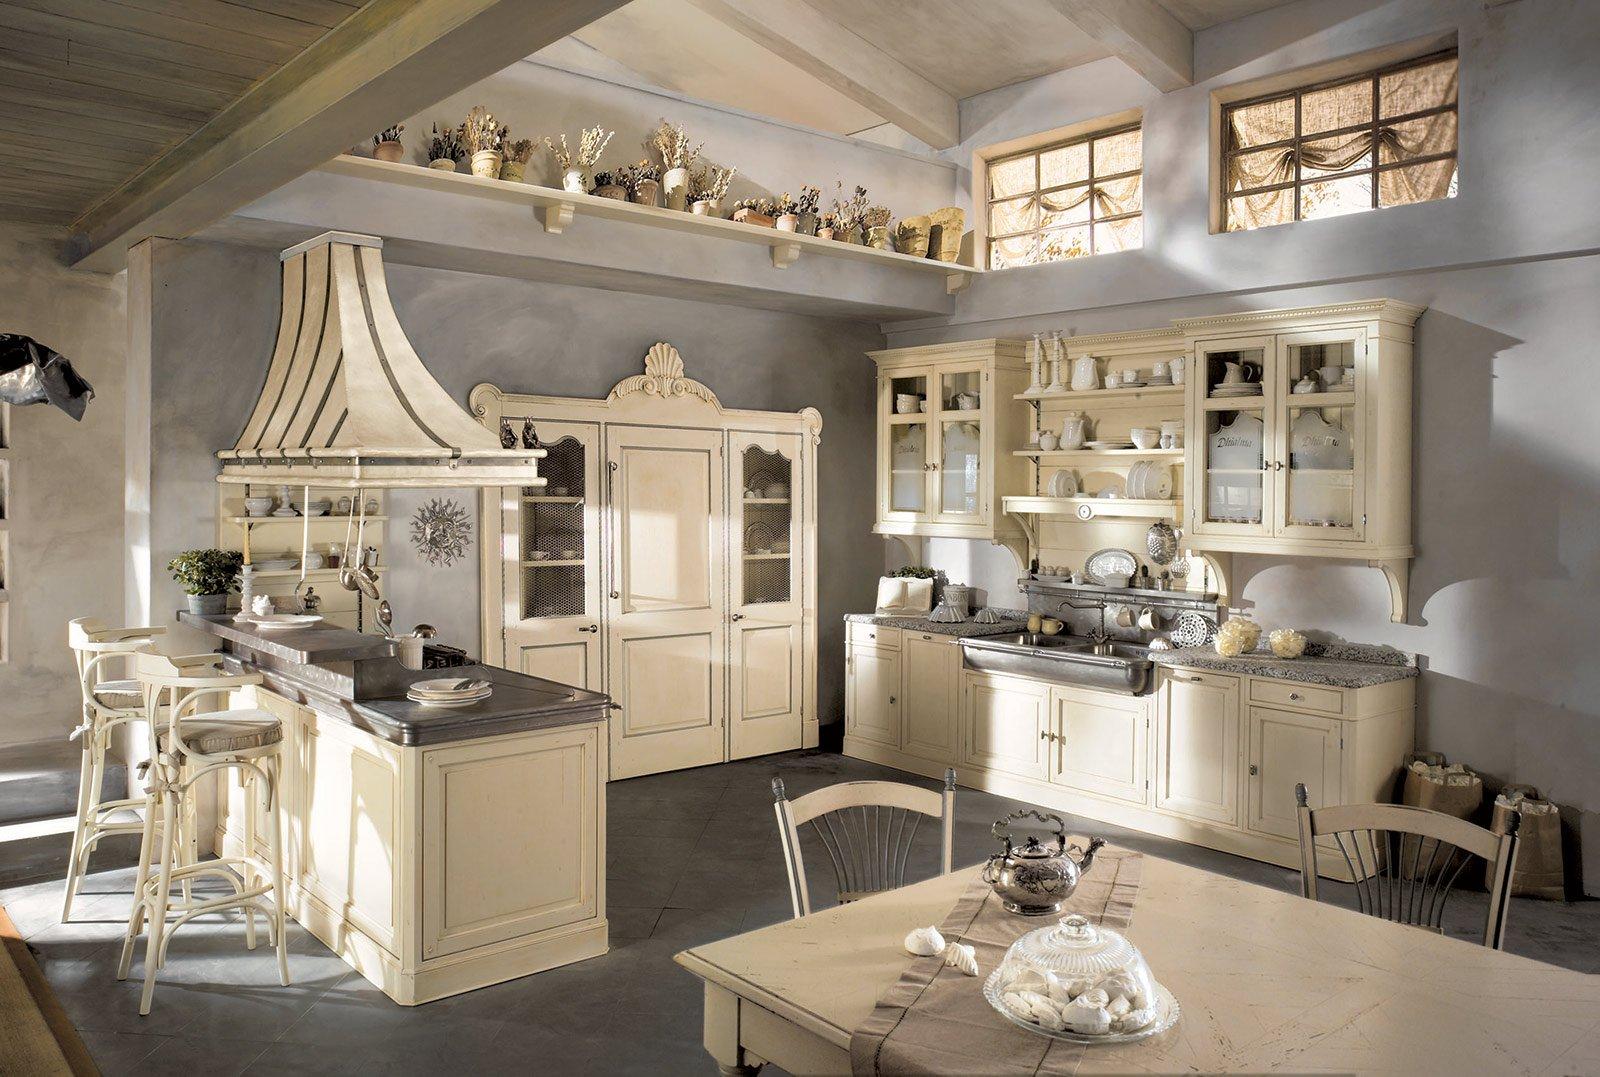 Cucina Con Bancone Bar : Cucine con bancone stile bar. Cucina con ...